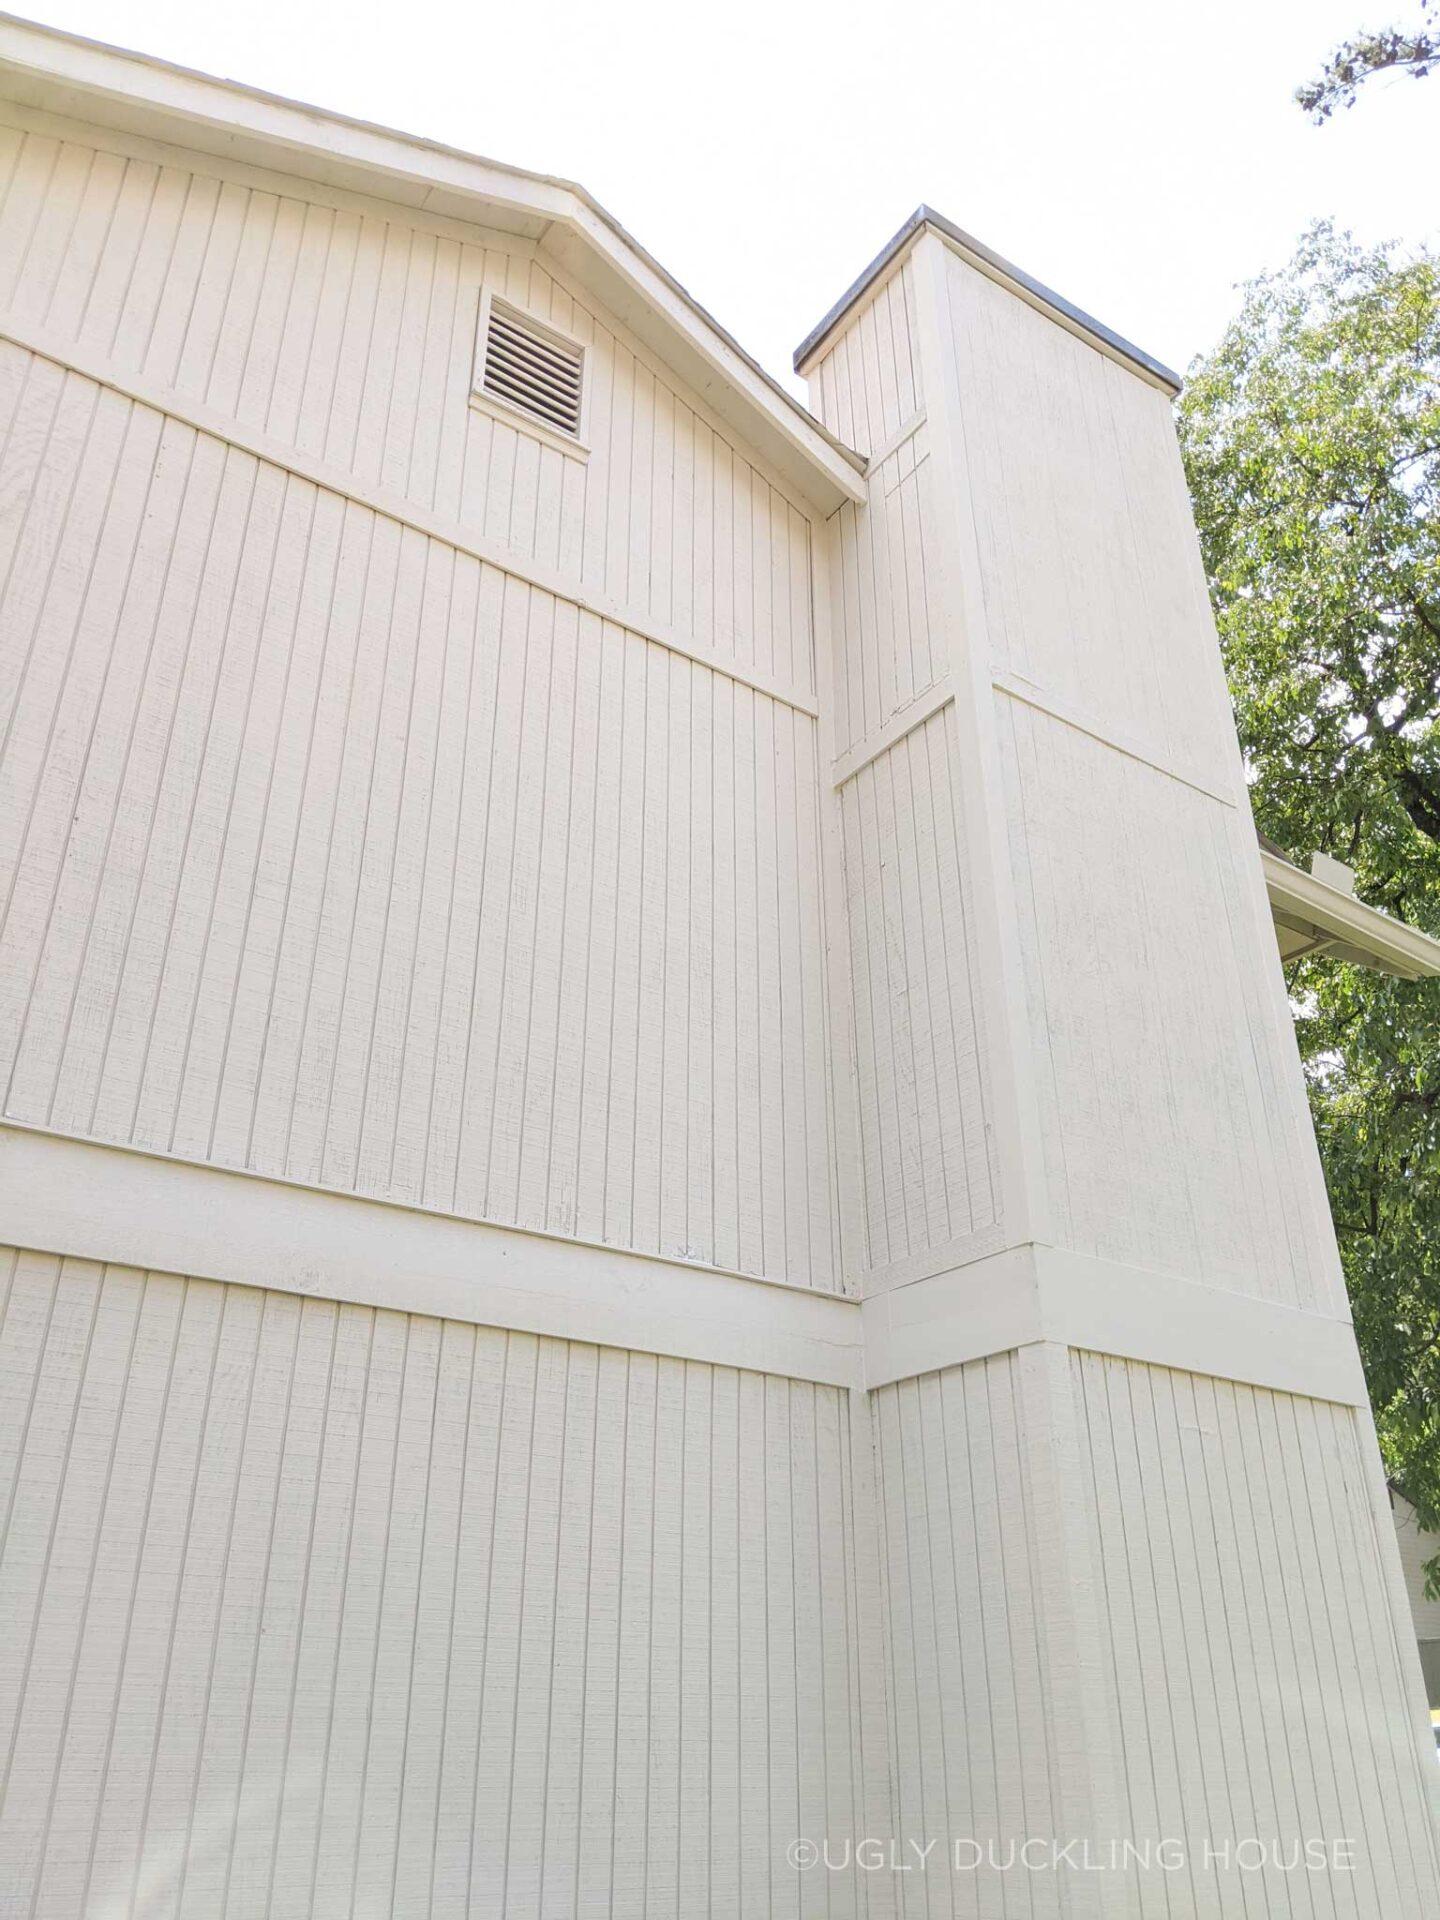 house siding after new Shoji White paint